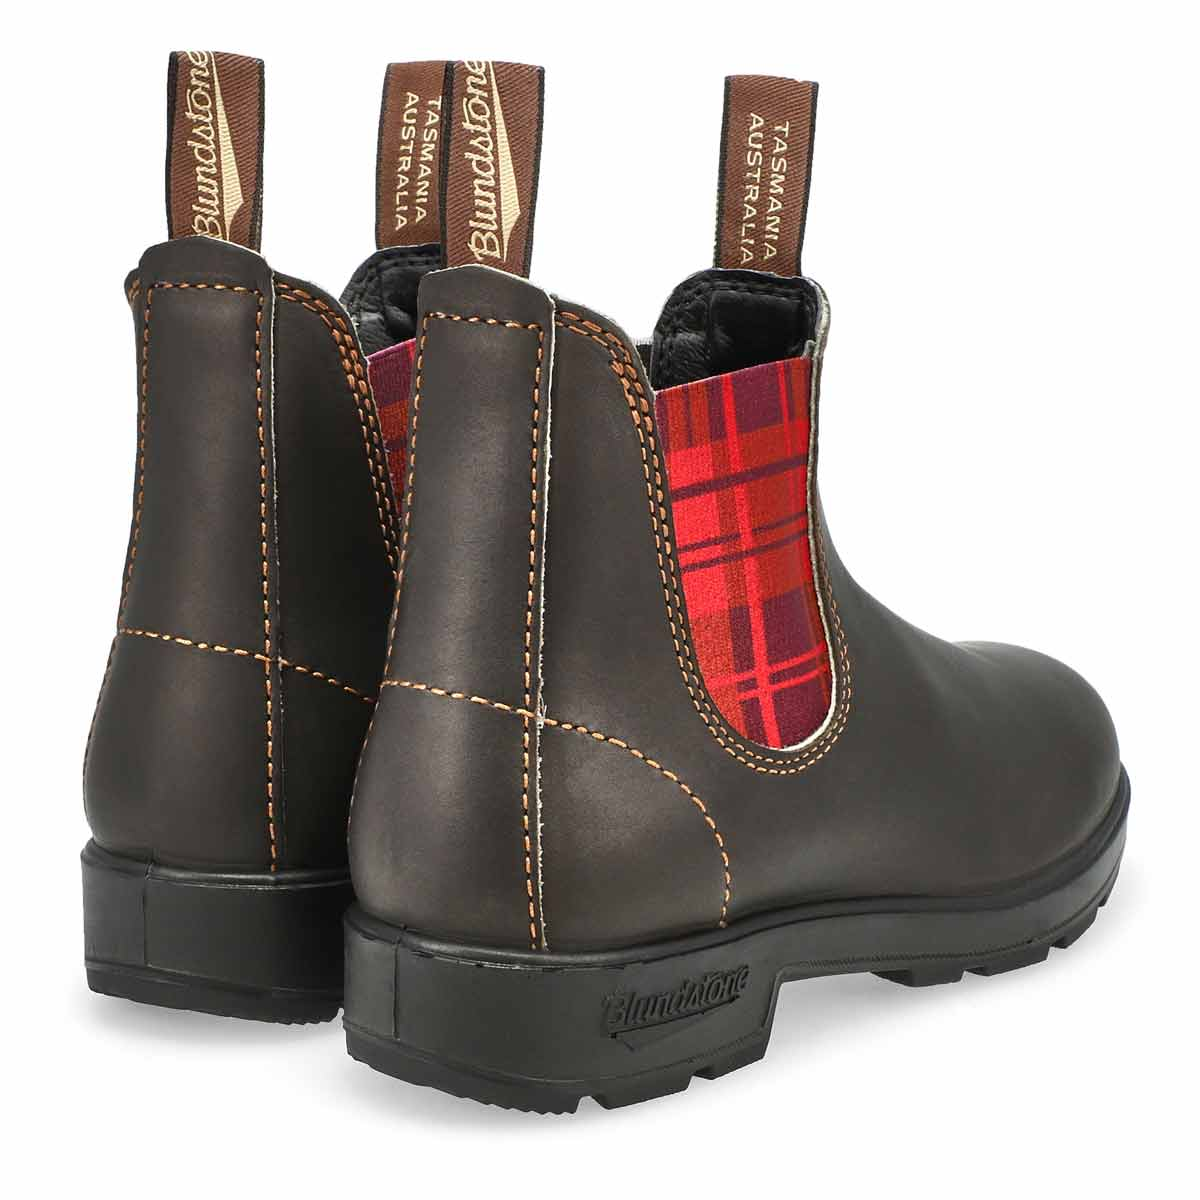 Unisex 2100 Original Boot - Brown/Burgundy